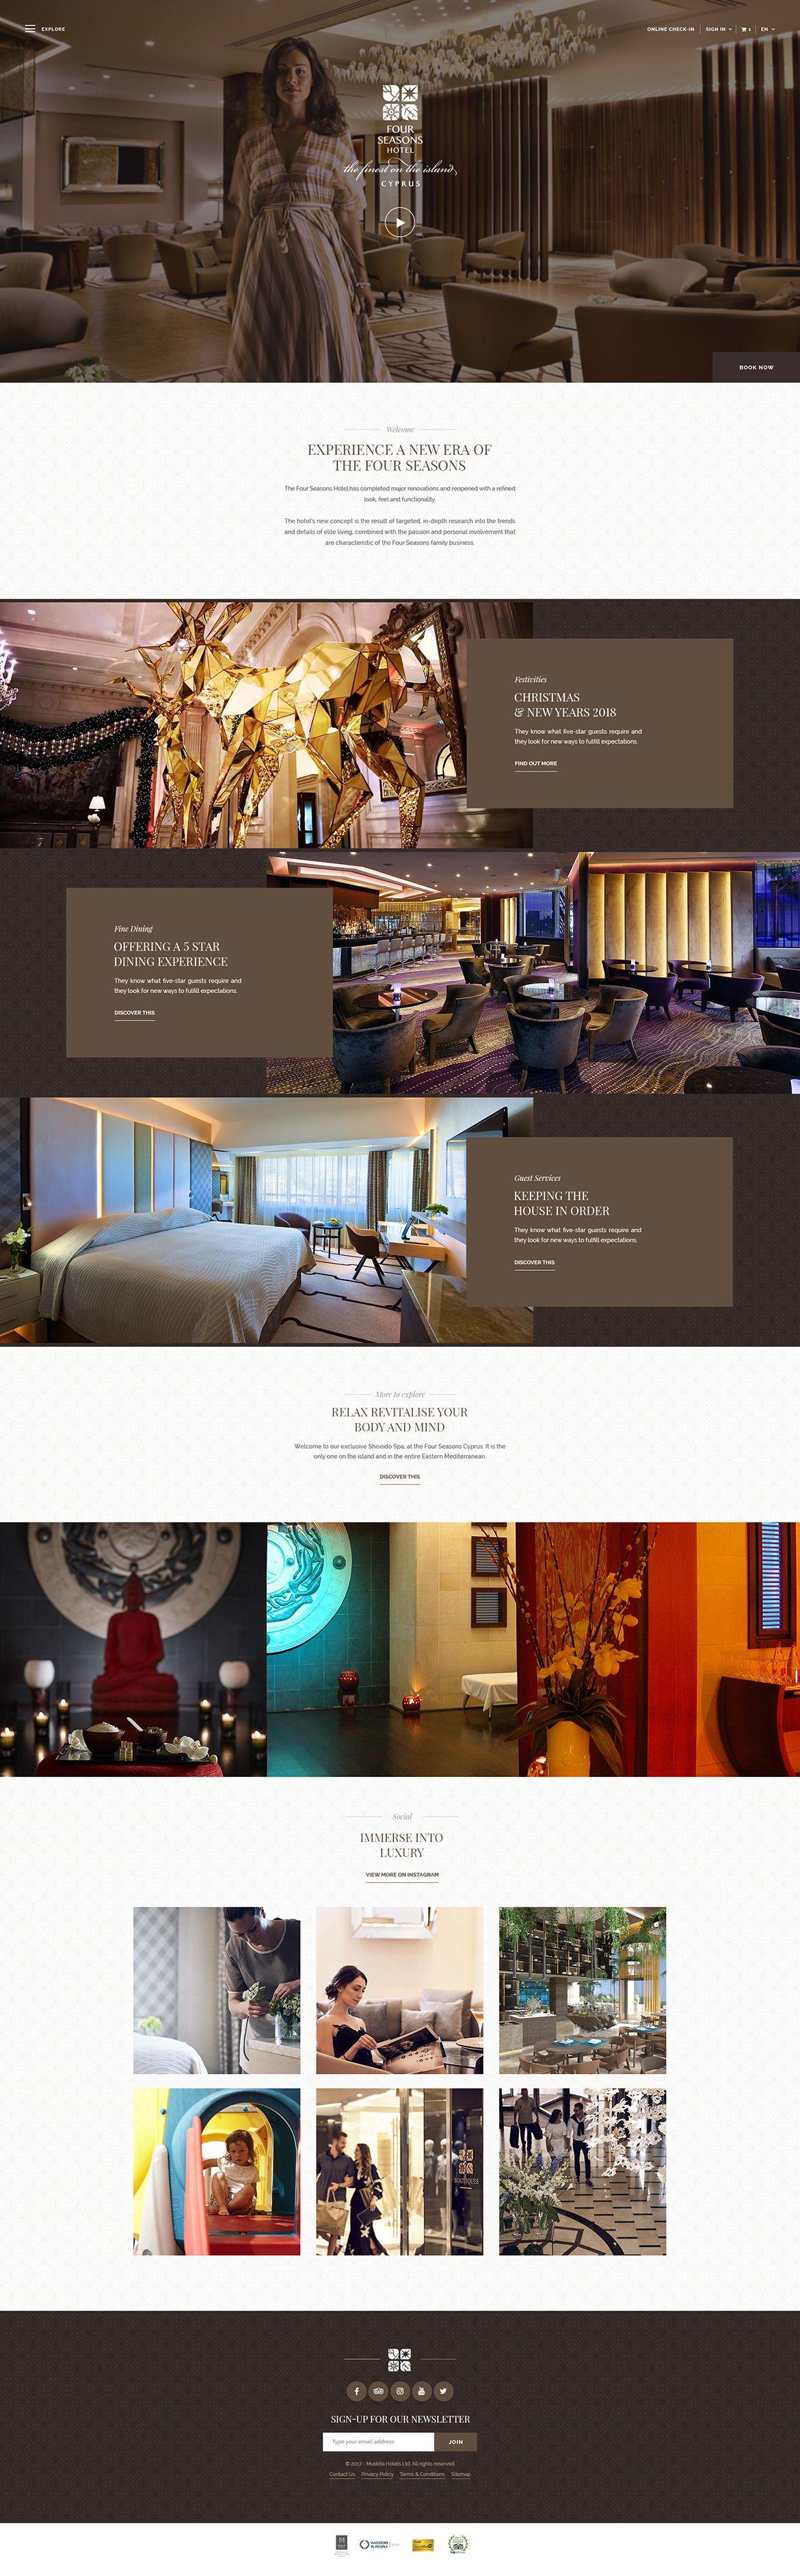 The Four Seasons Hotel Cyprus Web Design By Loris Stavrinides Elegant Website Design Four Seasons Hotel Fashion Web Design